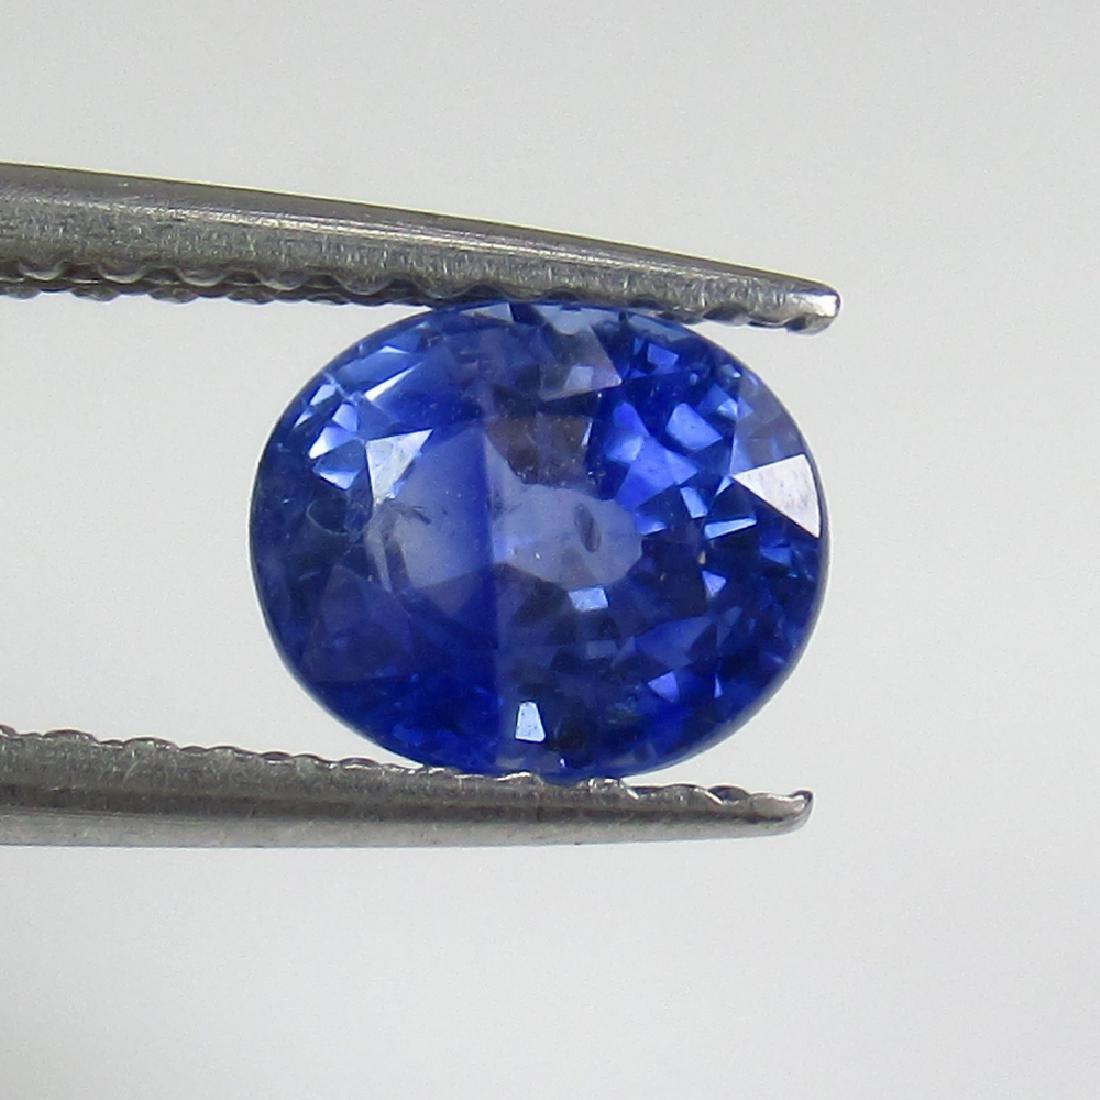 1.11 Ct Genuine Ceylon Blue Sapphire Oval Cut